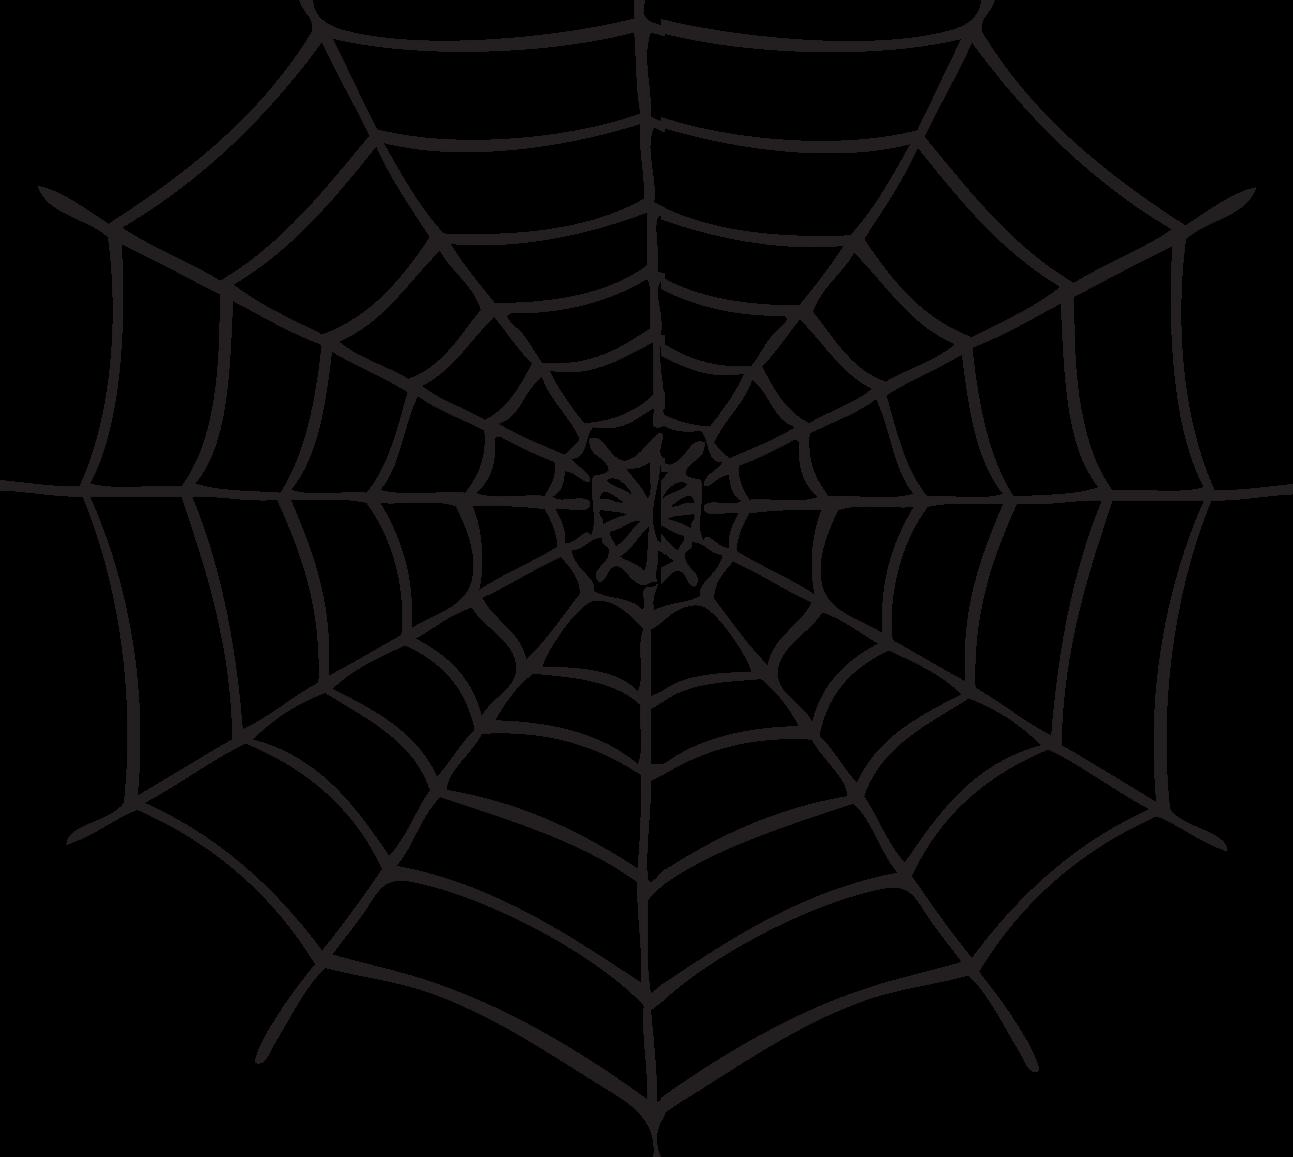 Clipart De Aranas Para Halloween